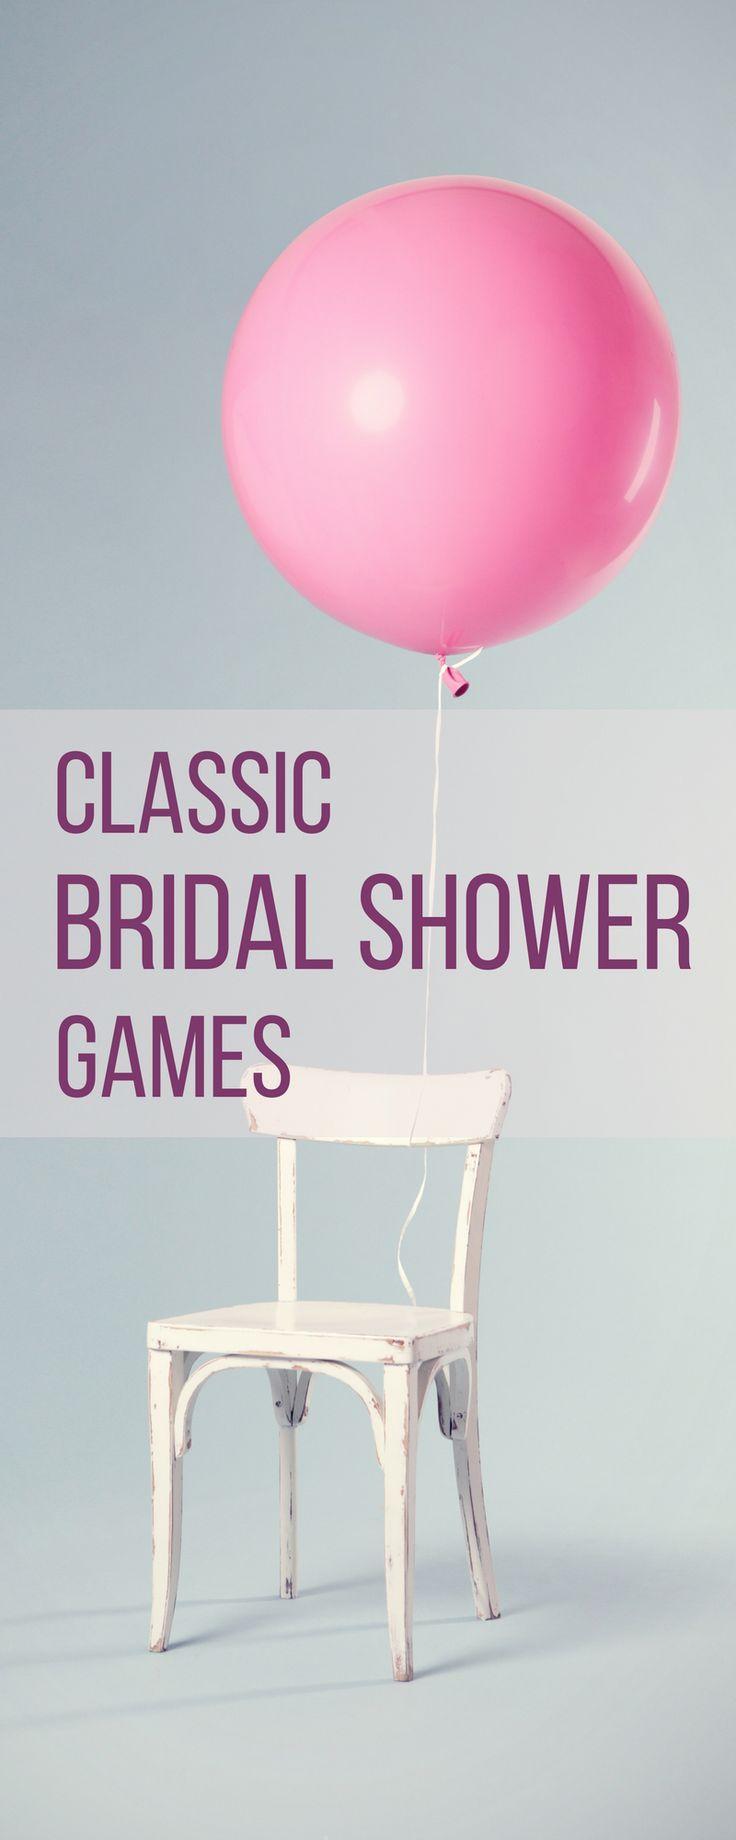 734c2c483b3f Classic Bridal Shower Games - Inspired Bride